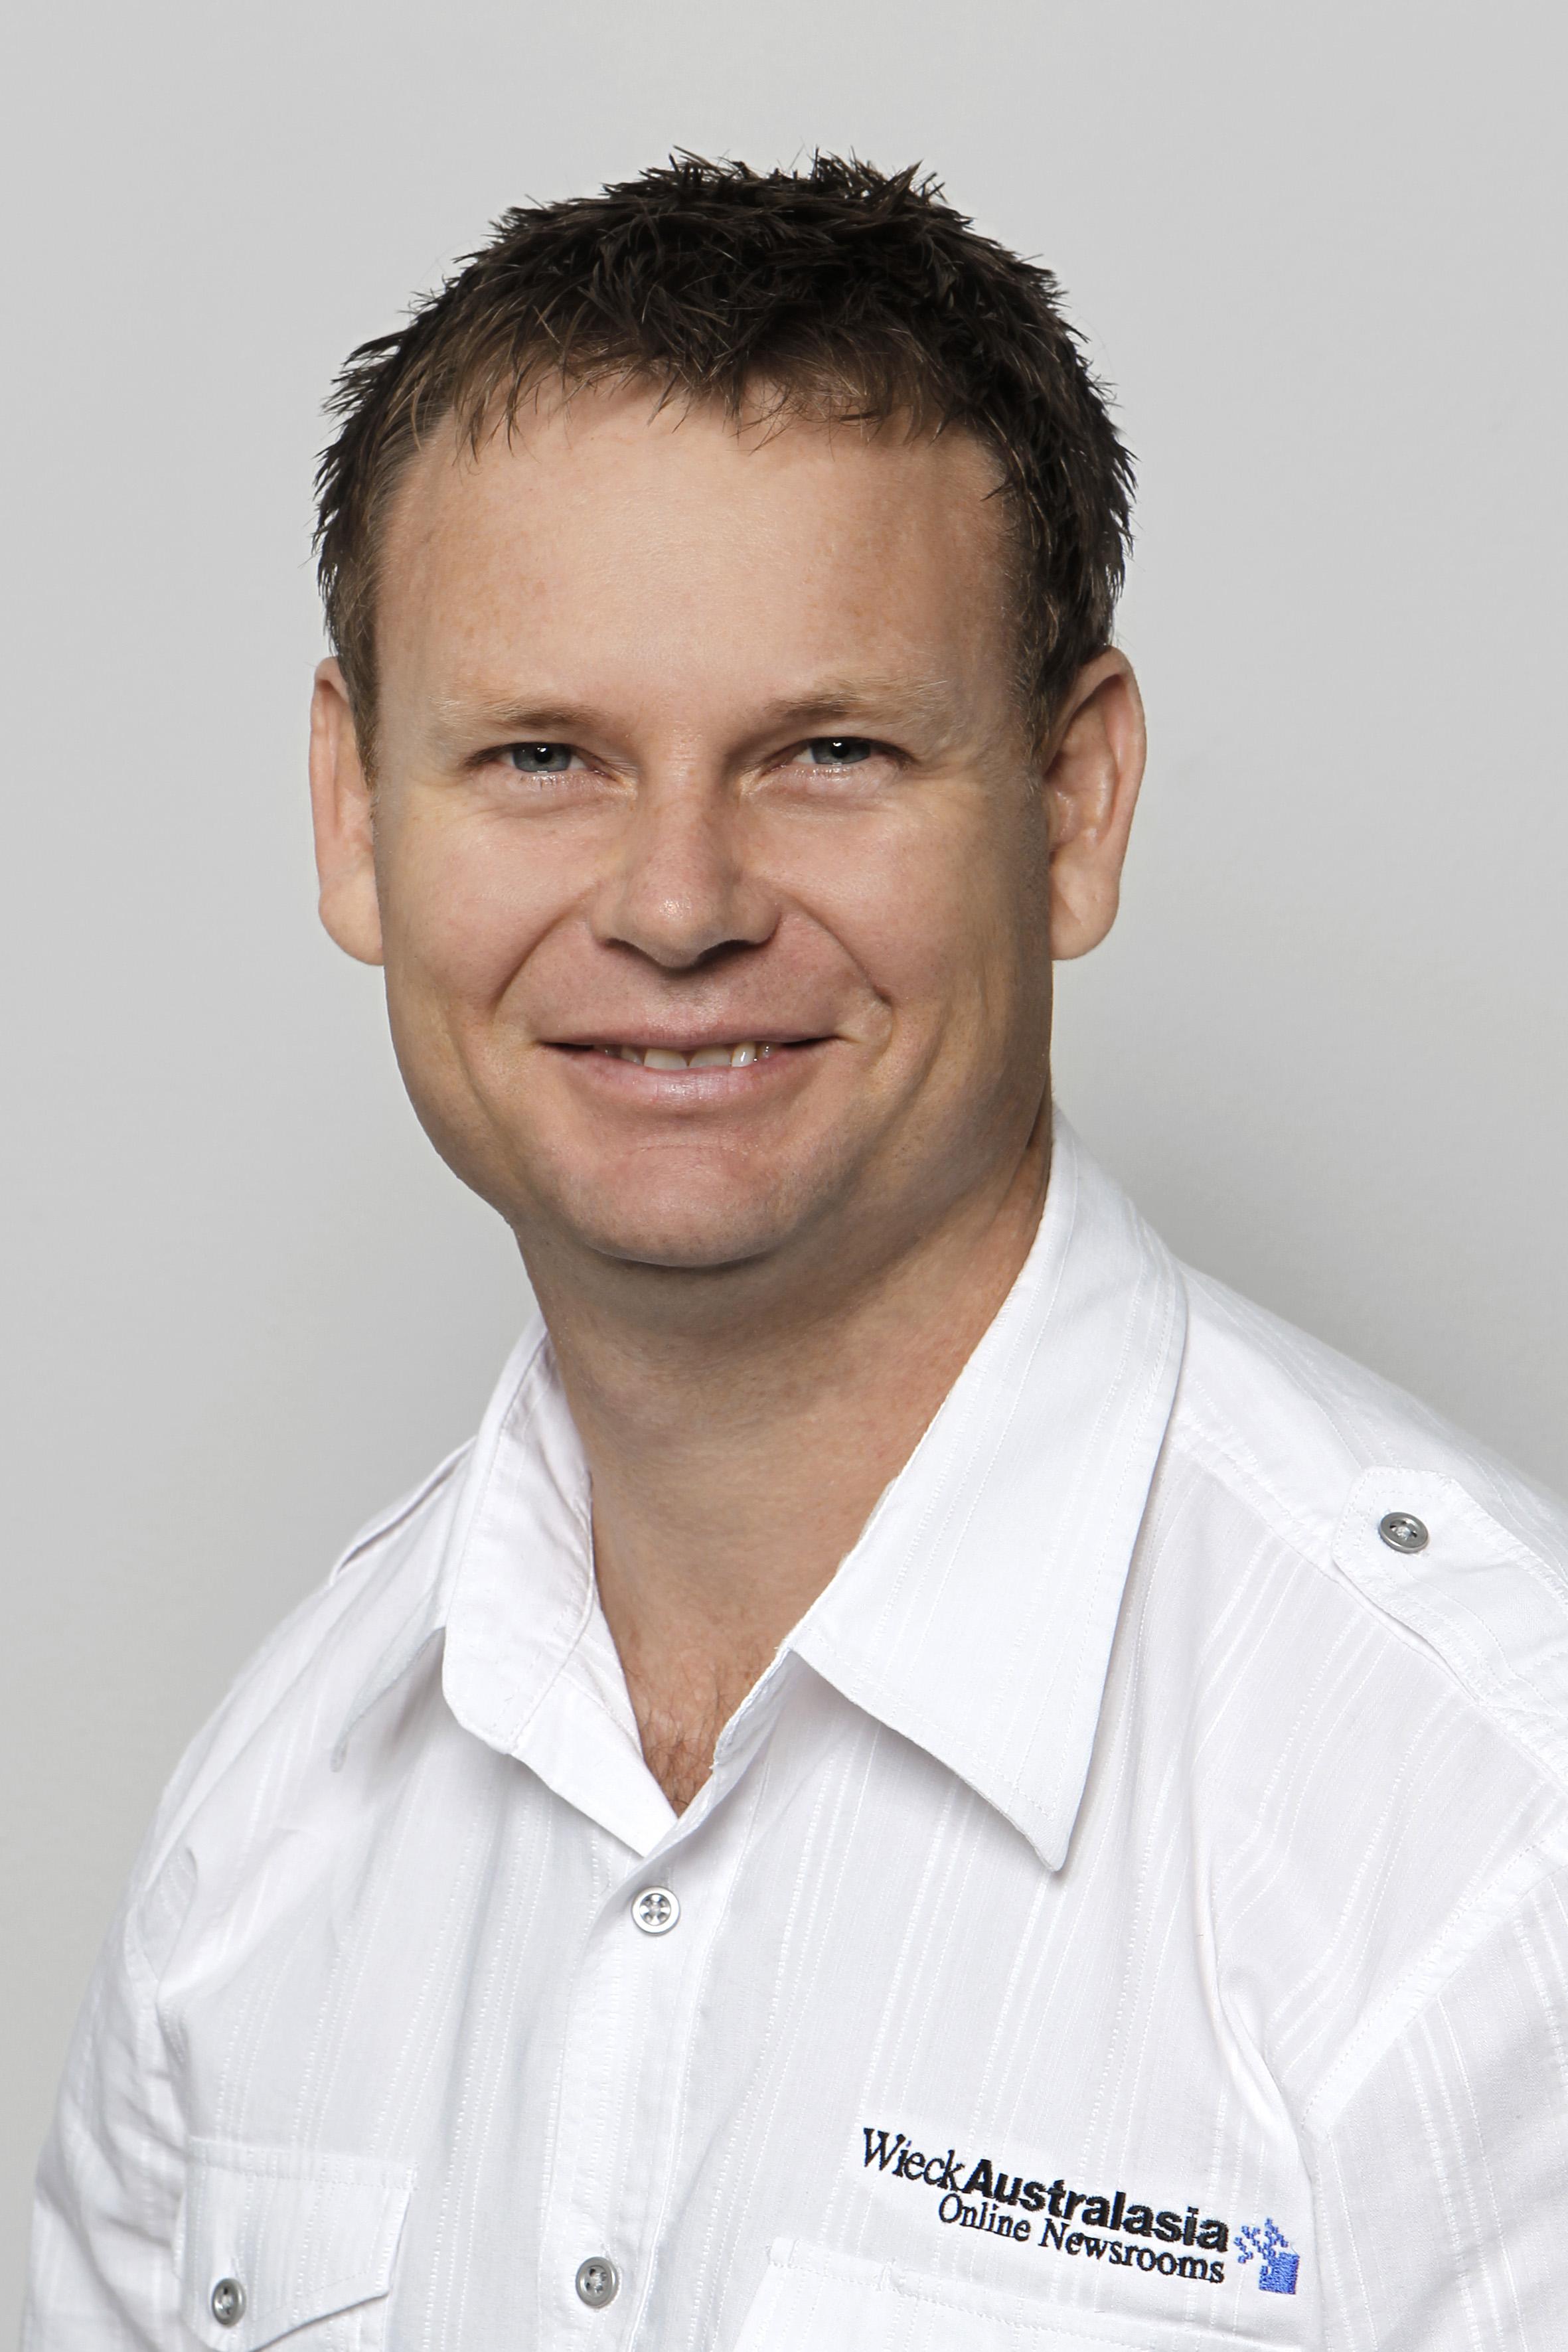 Warren Kirby, CEO, Wieck Australasia